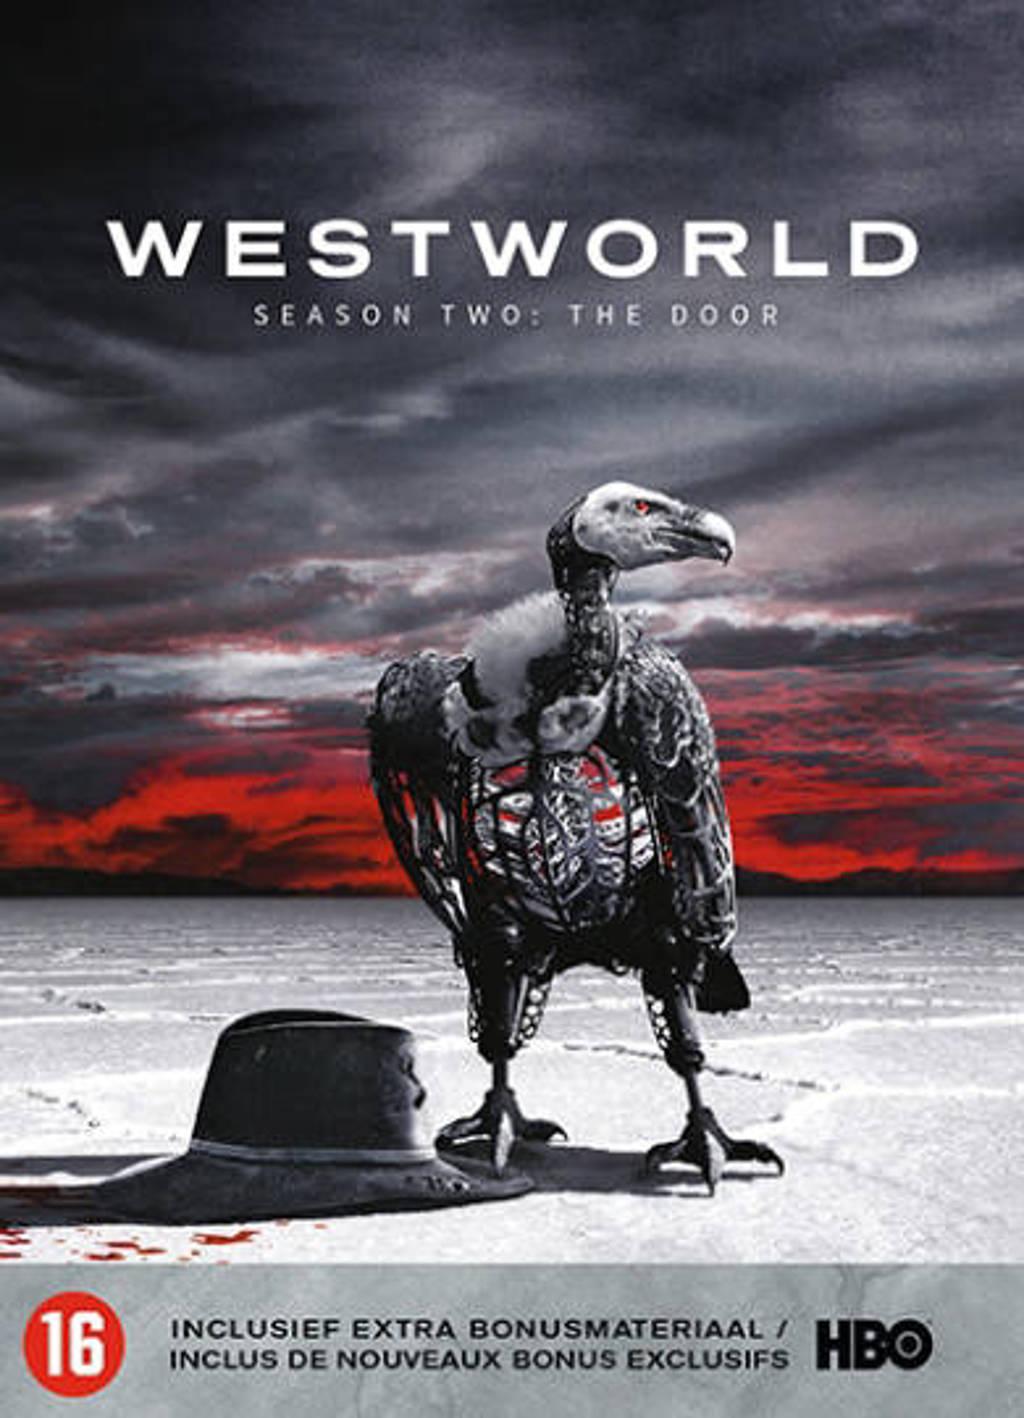 Westworld - Seizoen 2 (Limited edition) (DVD)